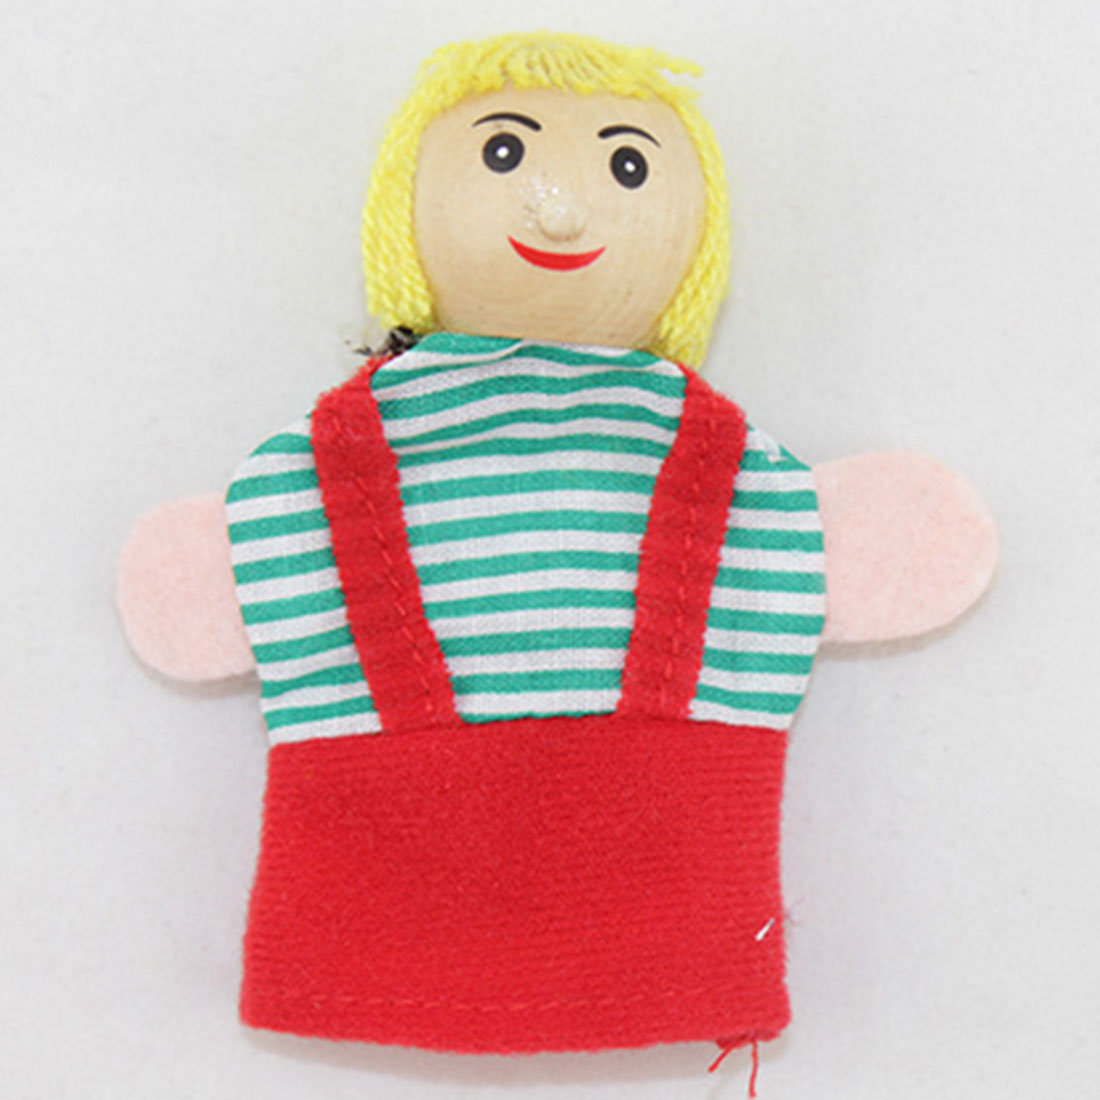 Surwish-6PCSSet-Family-Finger-Puppets-Storytelling-Doll-Kids-Children-Baby-Educational-Toys-4